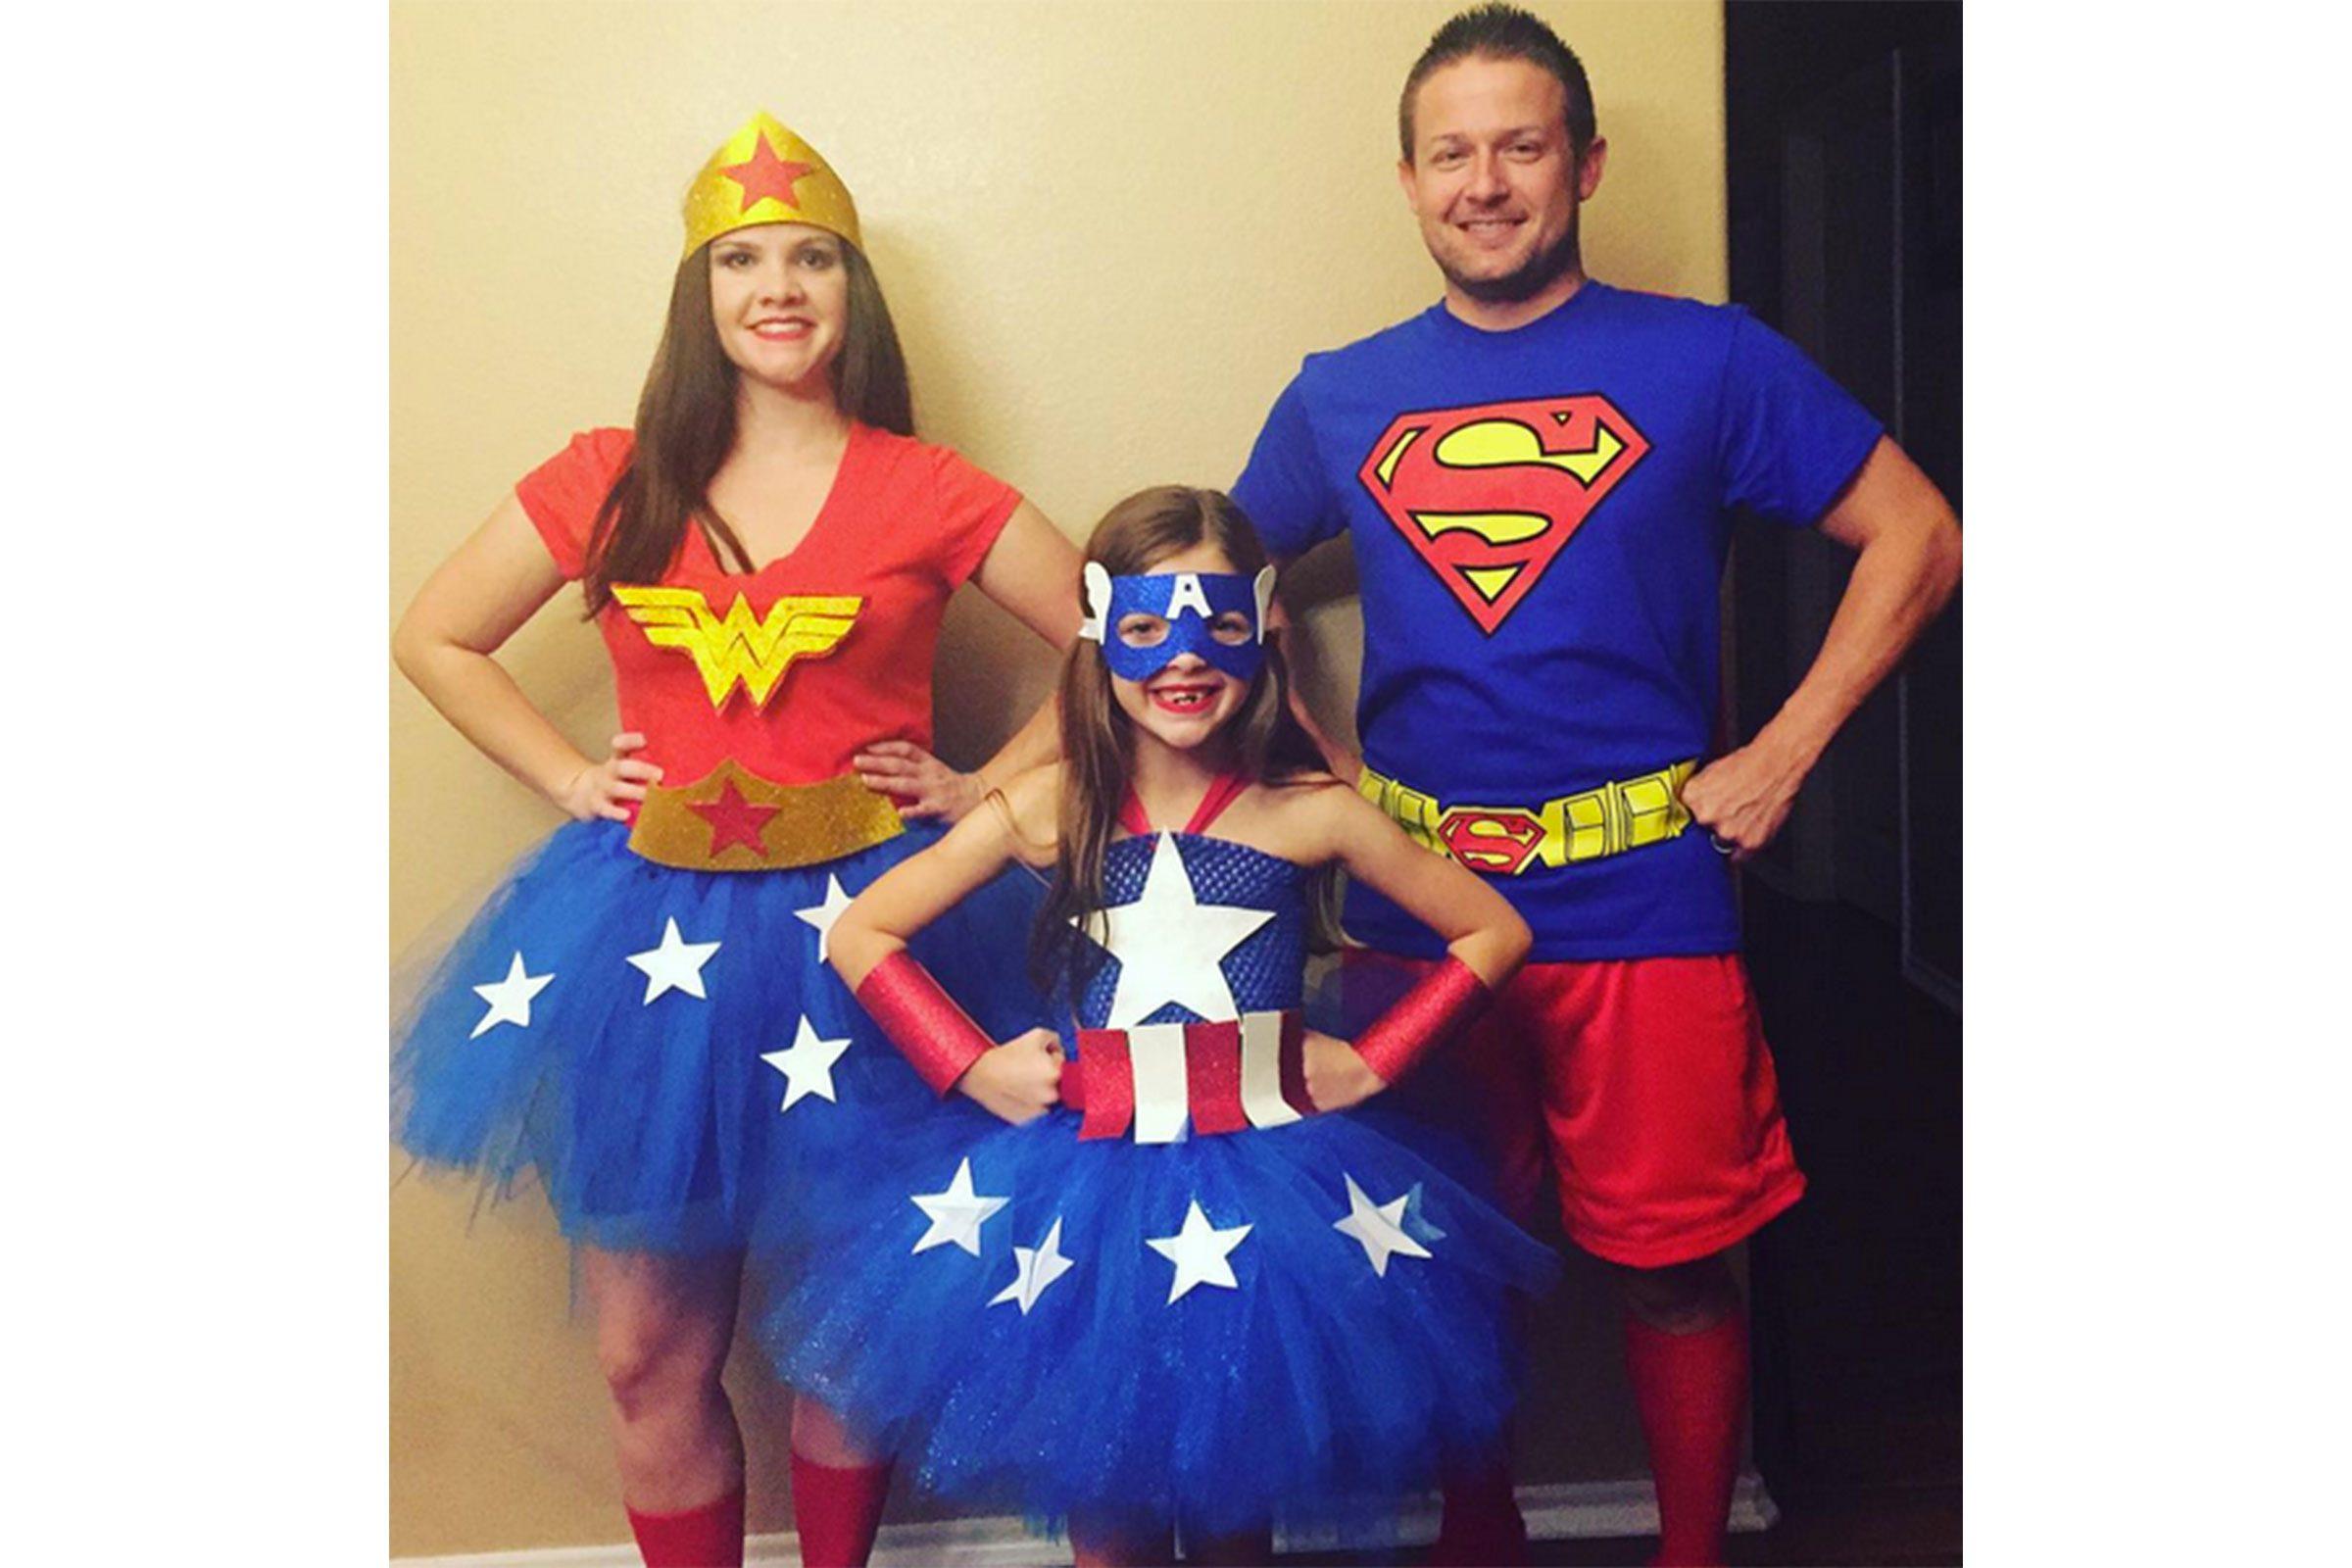 superhero family - Bar Of Soap Halloween Costume